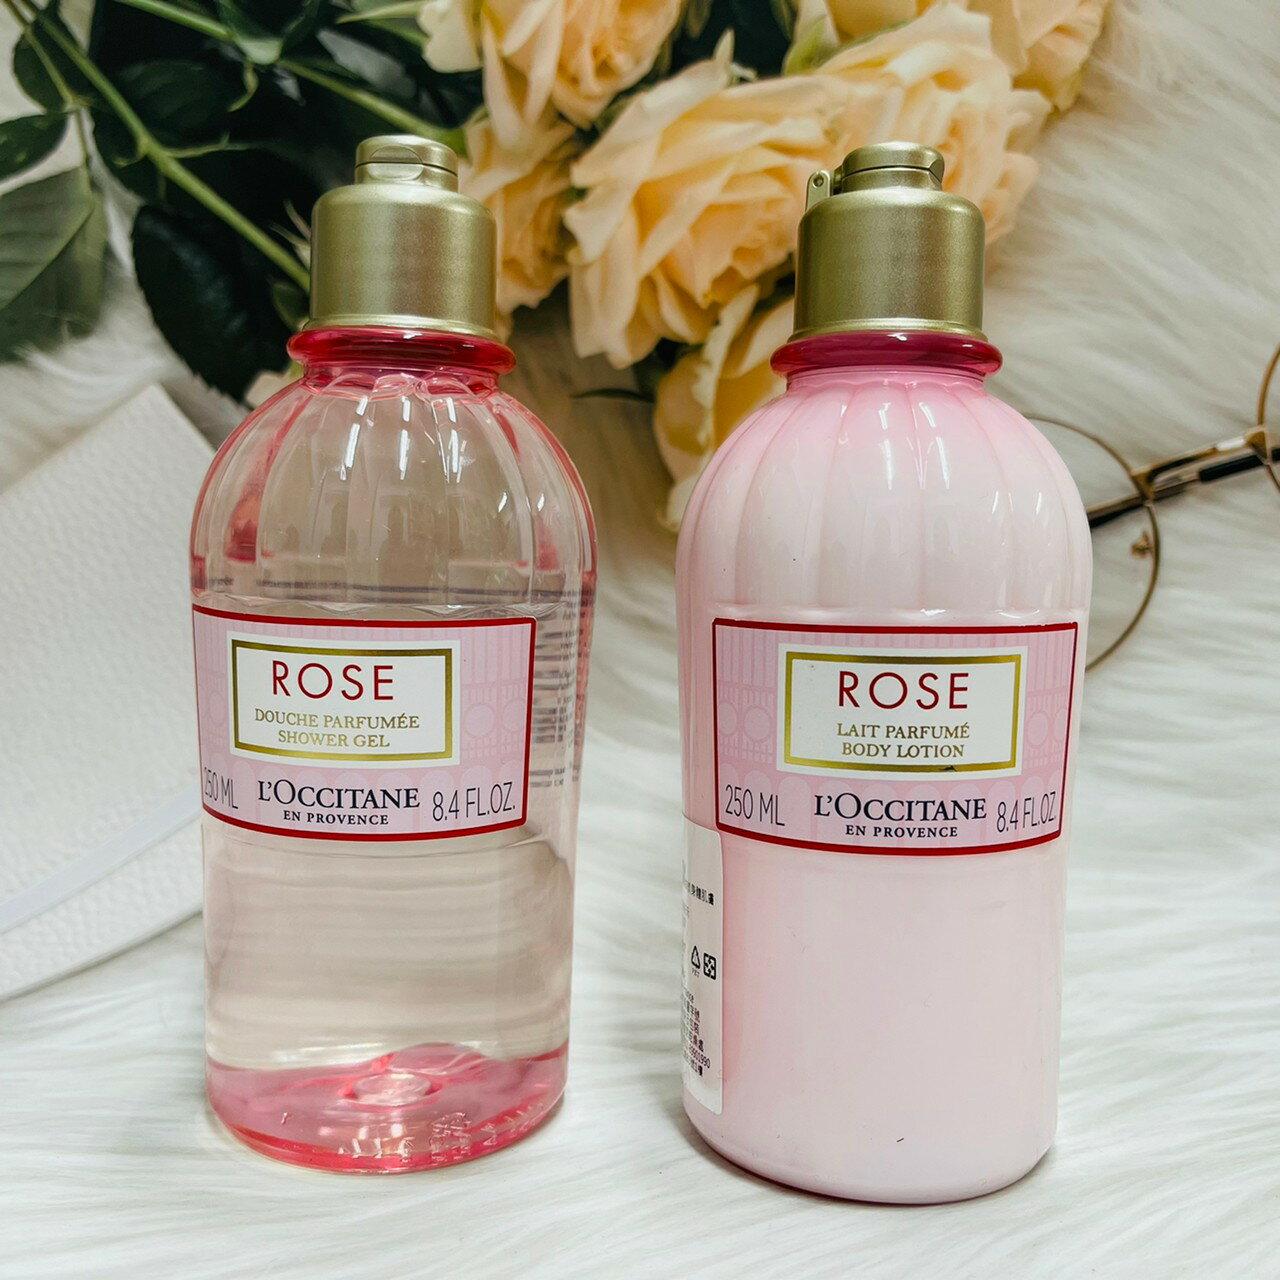 L'OCCITANE 歐舒丹 玫瑰皇后身體乳/玫瑰沐浴膠  250ml